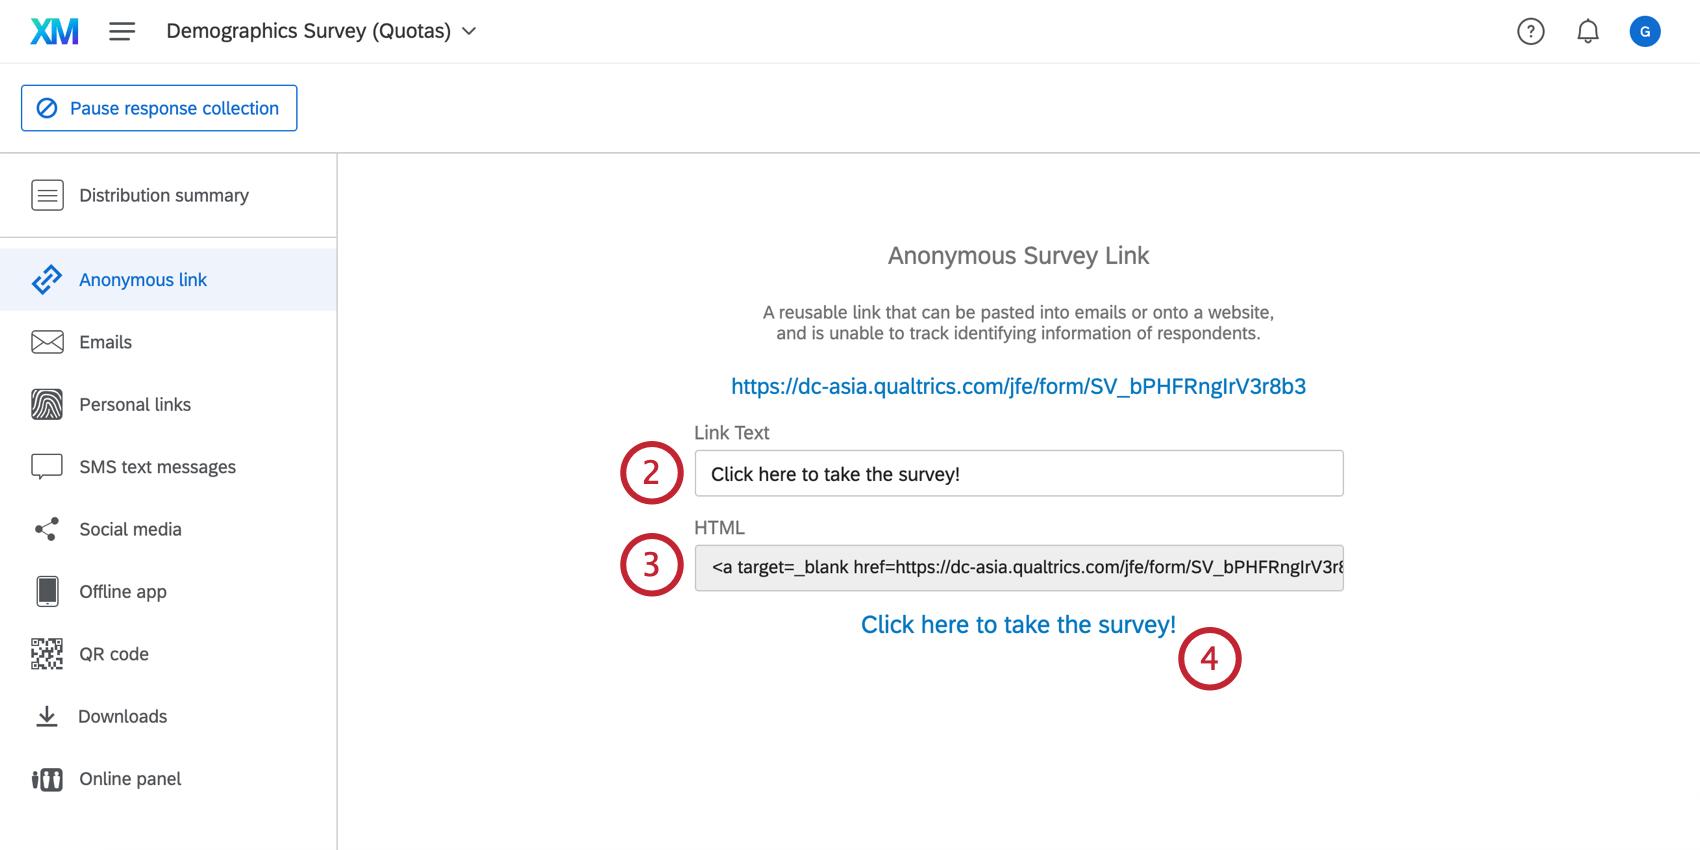 Customizing the link text